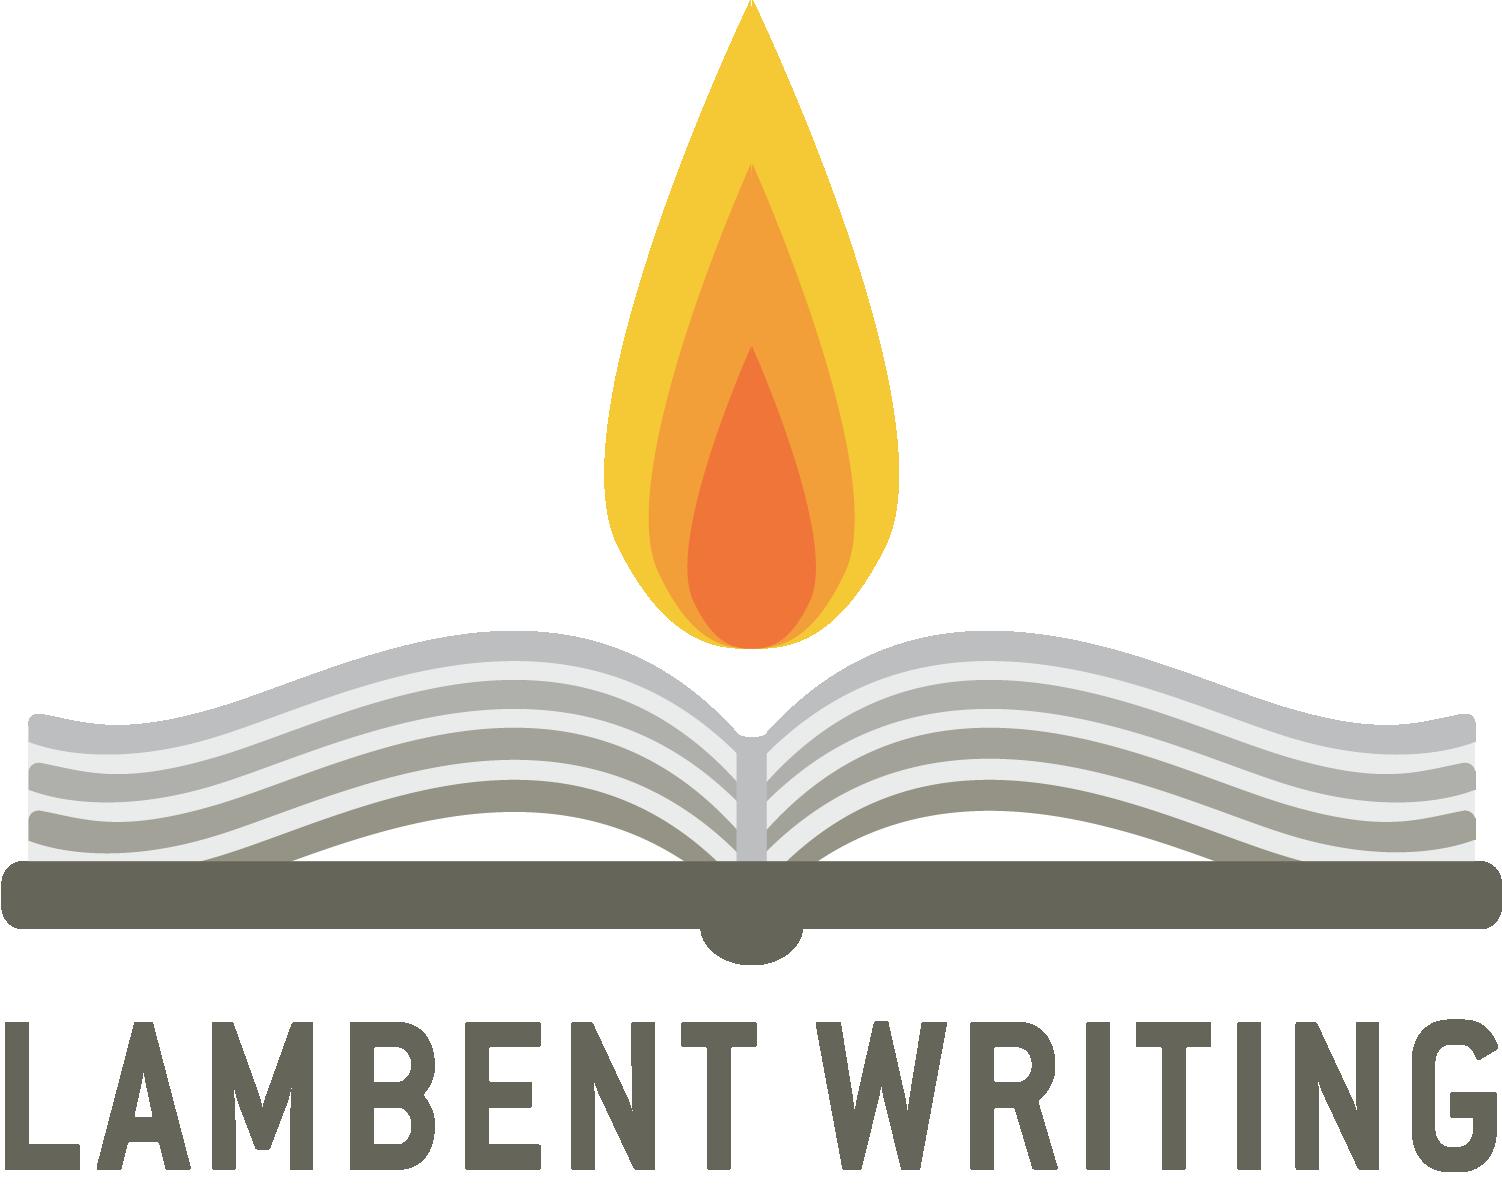 Lambent Writing